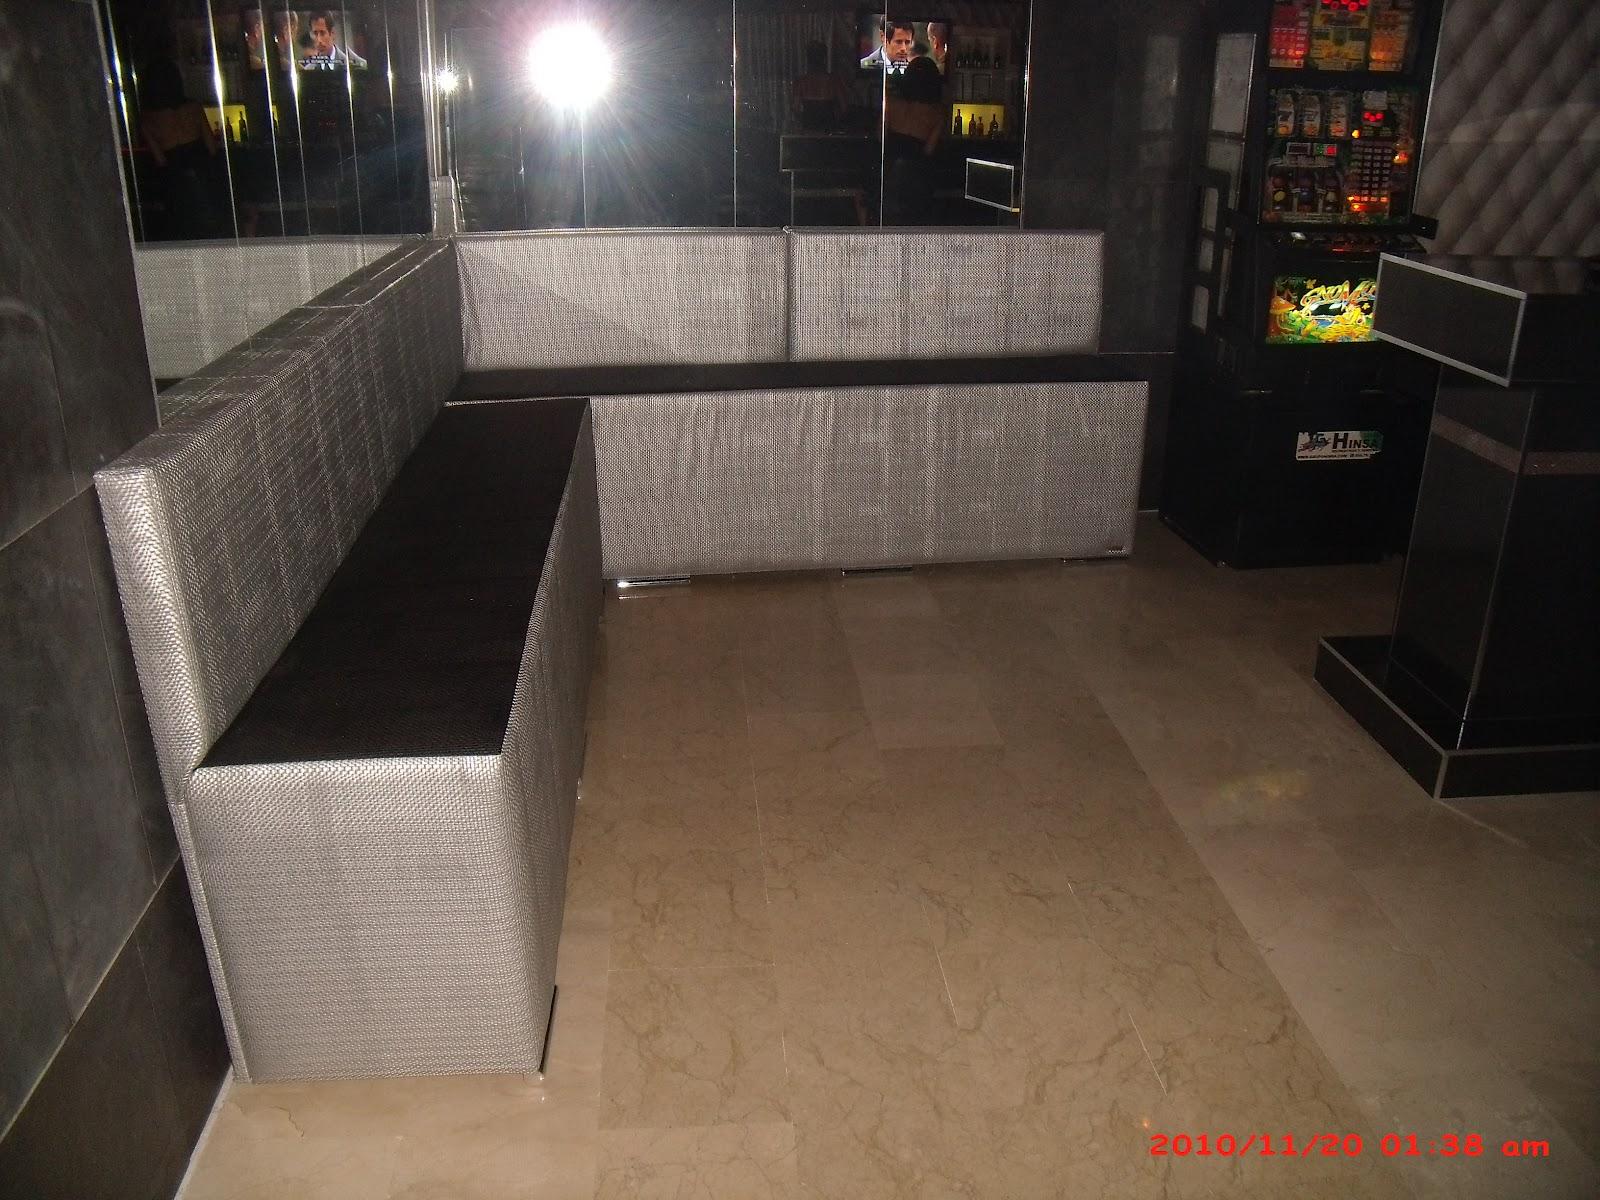 precios sofas ta quatro gumtree modular sofa sydney tapizados j muÑoz arreglos realizados y a medida